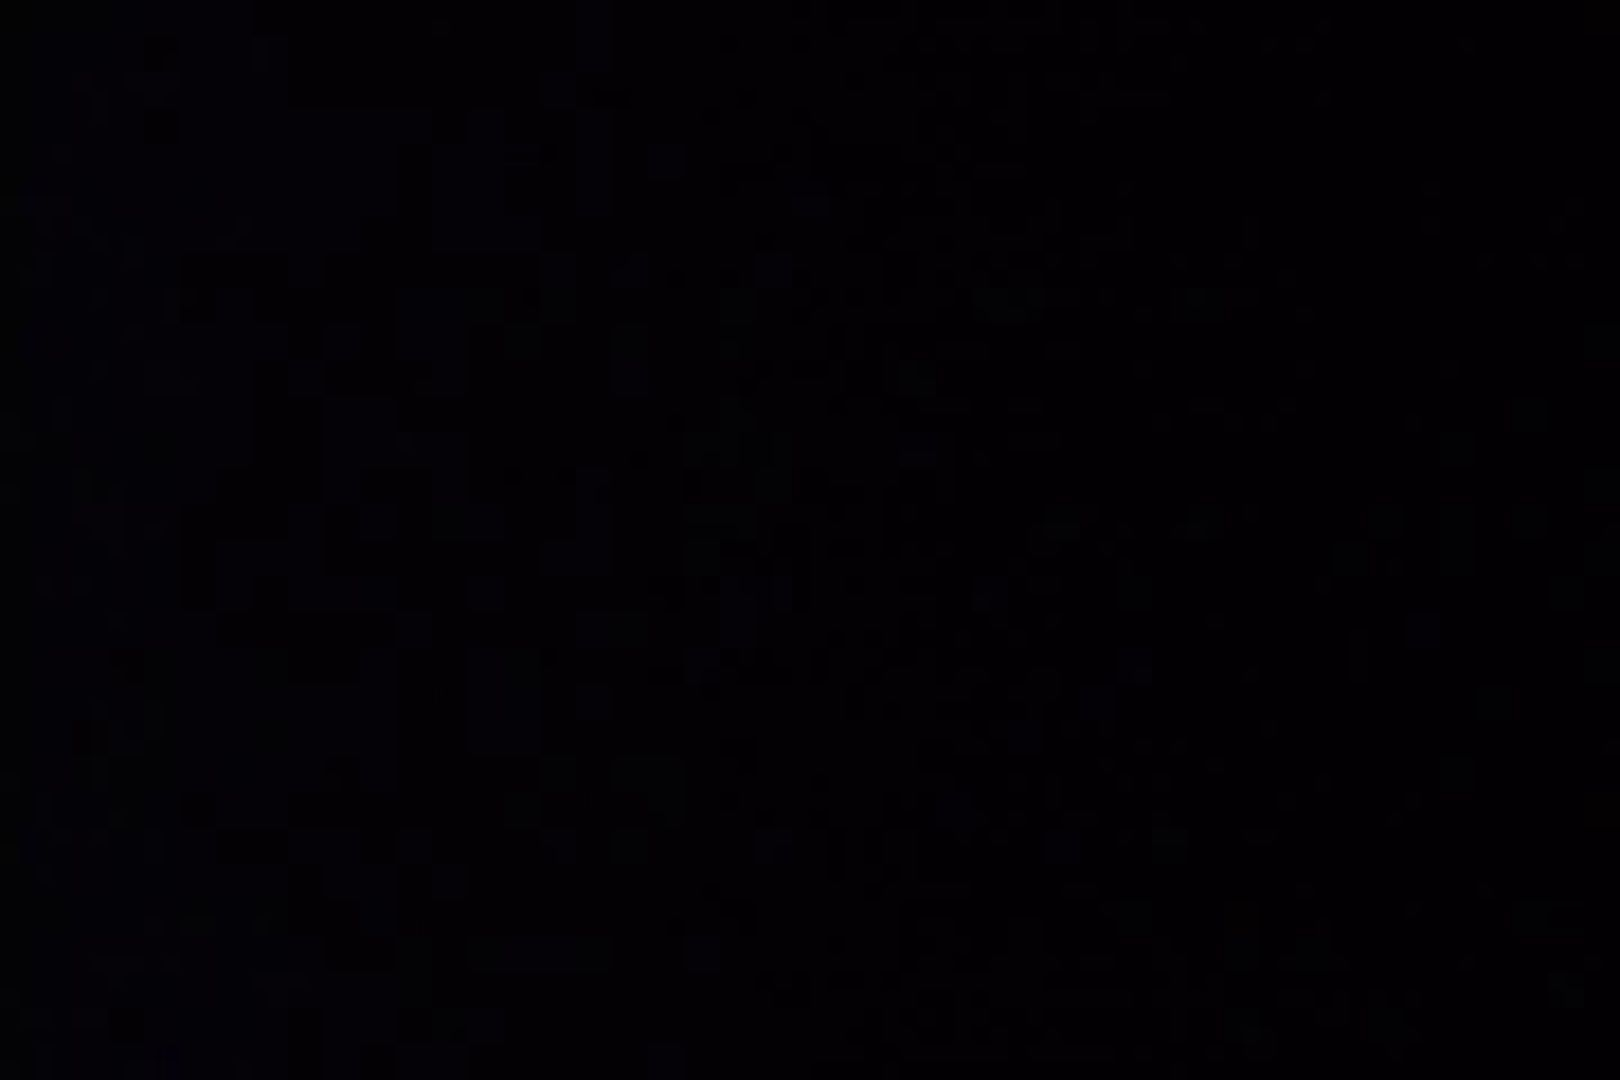 STY-016 女子大生●盗撮 お便所百選・百態の職人芸 女子大生特集  95連発 48